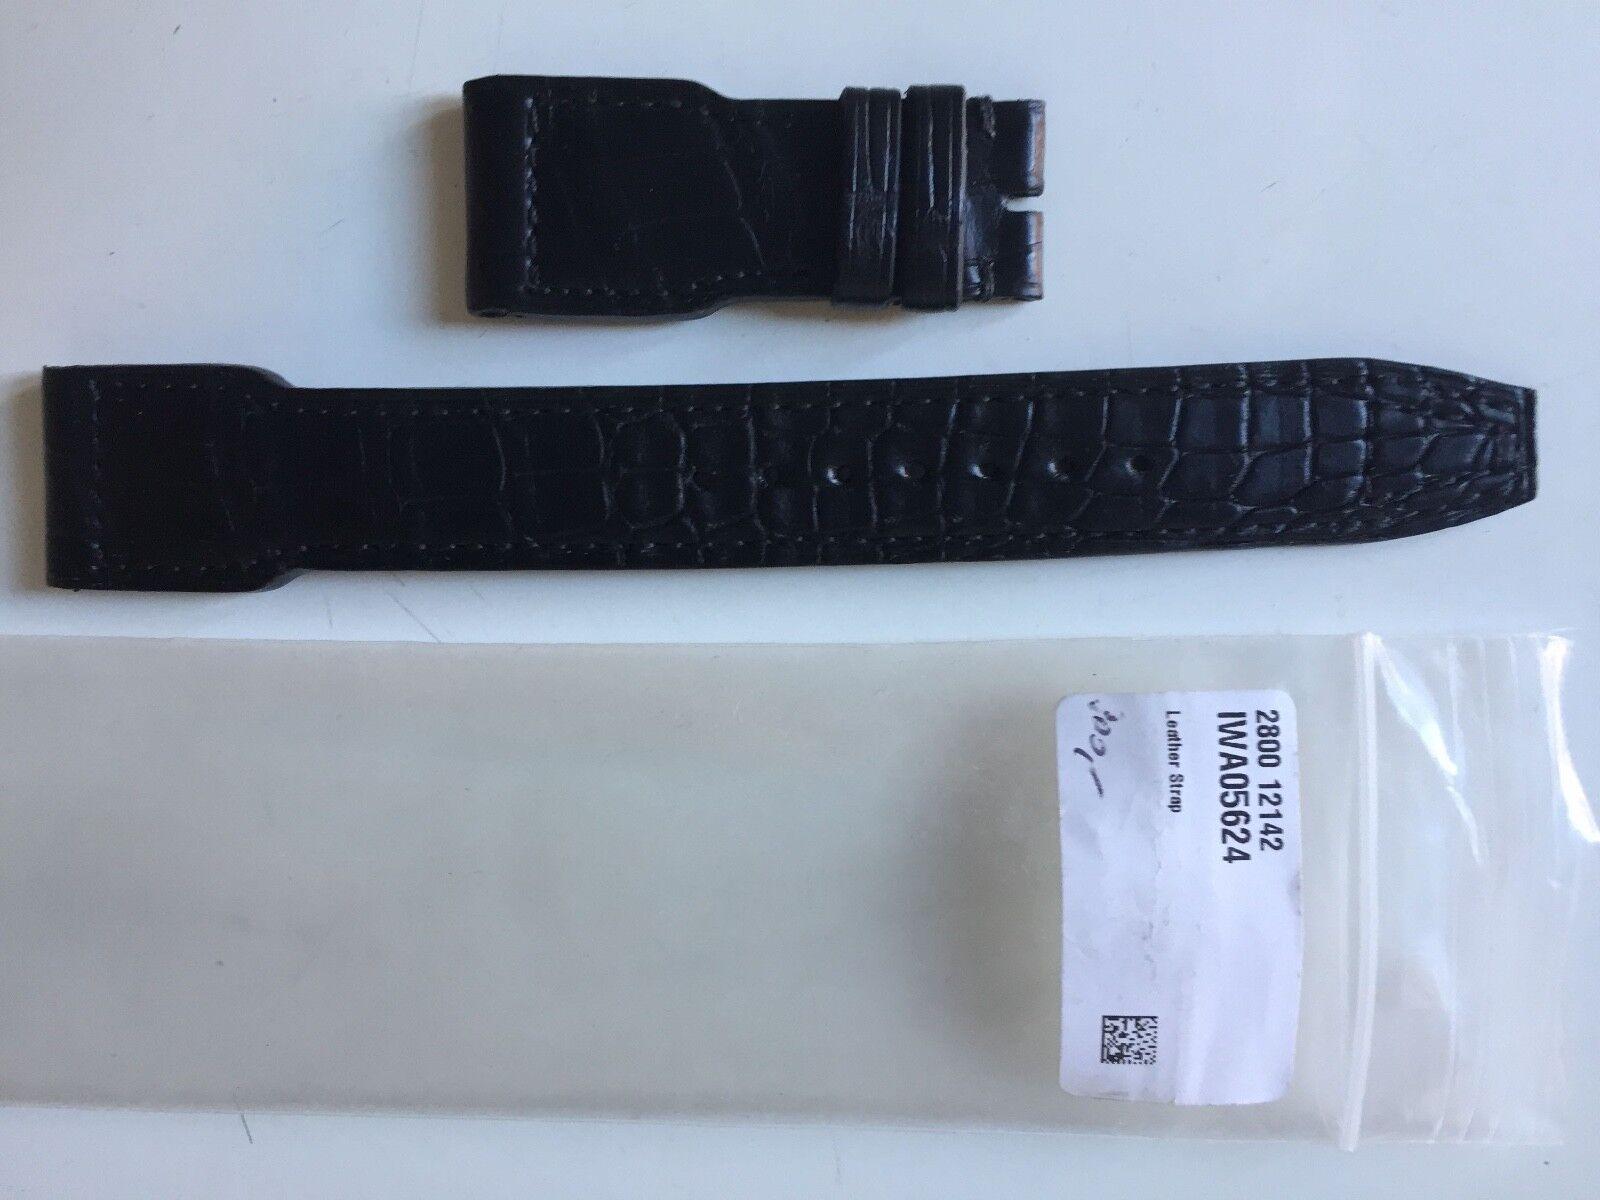 IWC Pilot Uhrenarmband Alligatorenleder Schwarz 21/18 mm